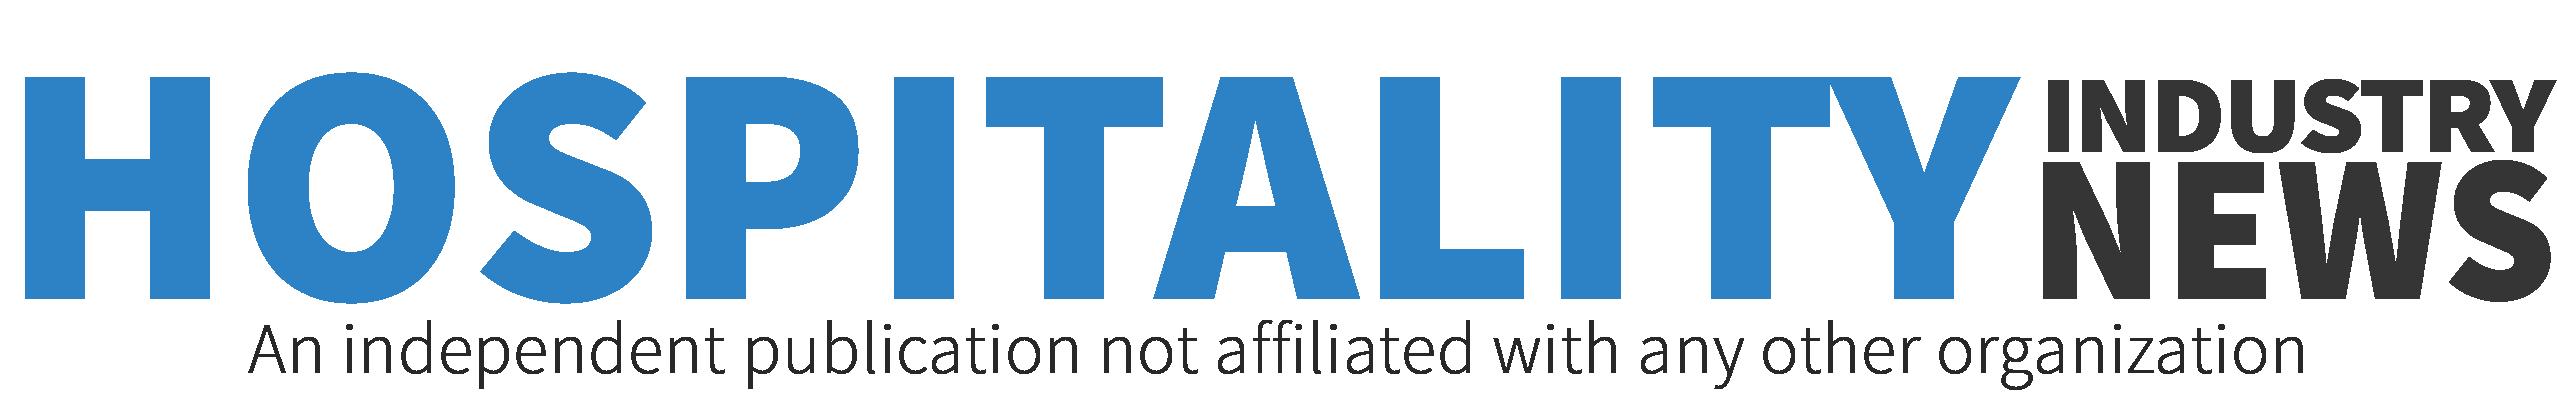 Hospitality Industry News logo